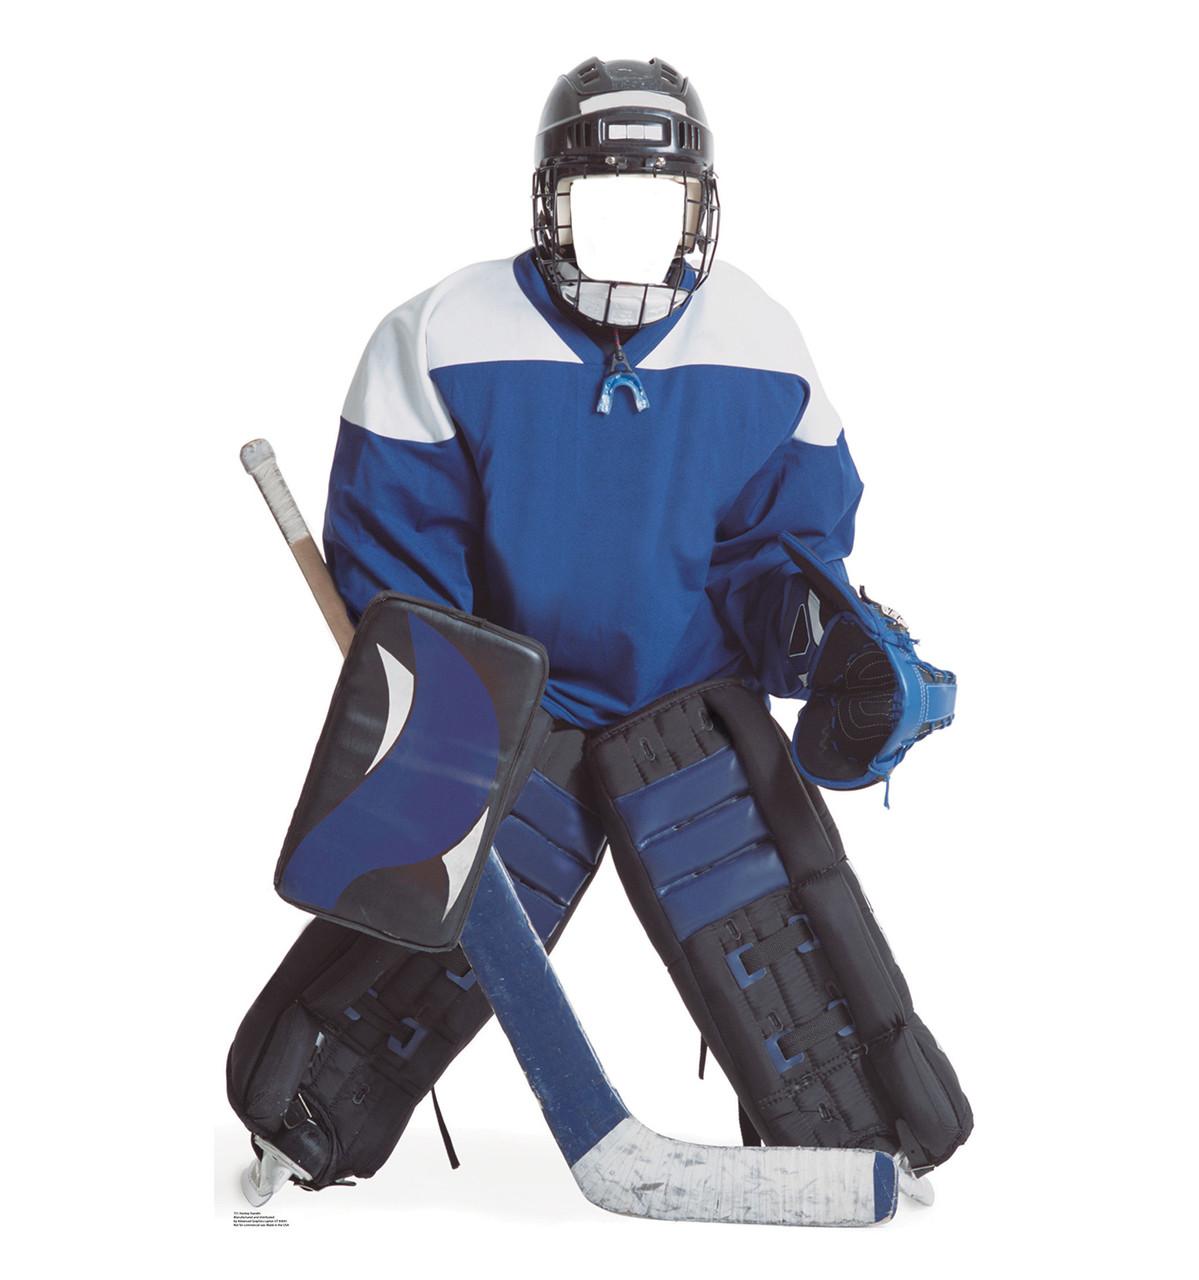 Life-size Hockey Player Stand-in Cardboard Standup | Cardboard Cutout